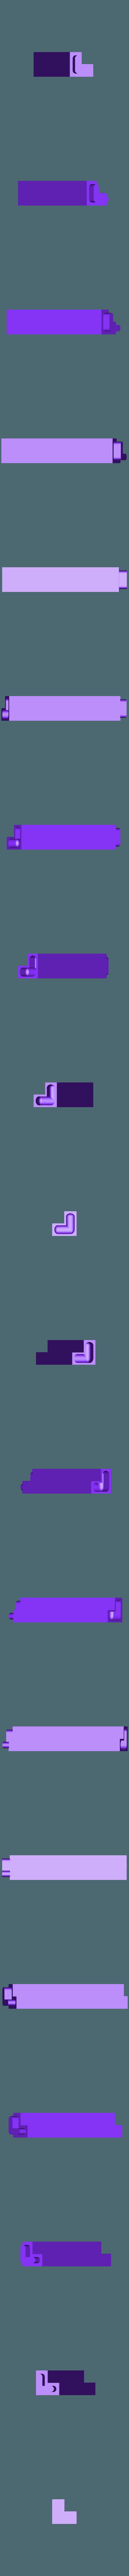 Modular_Pillar.stl Download free STL file Modular Mech Buildings • 3D printable object, mrhers2